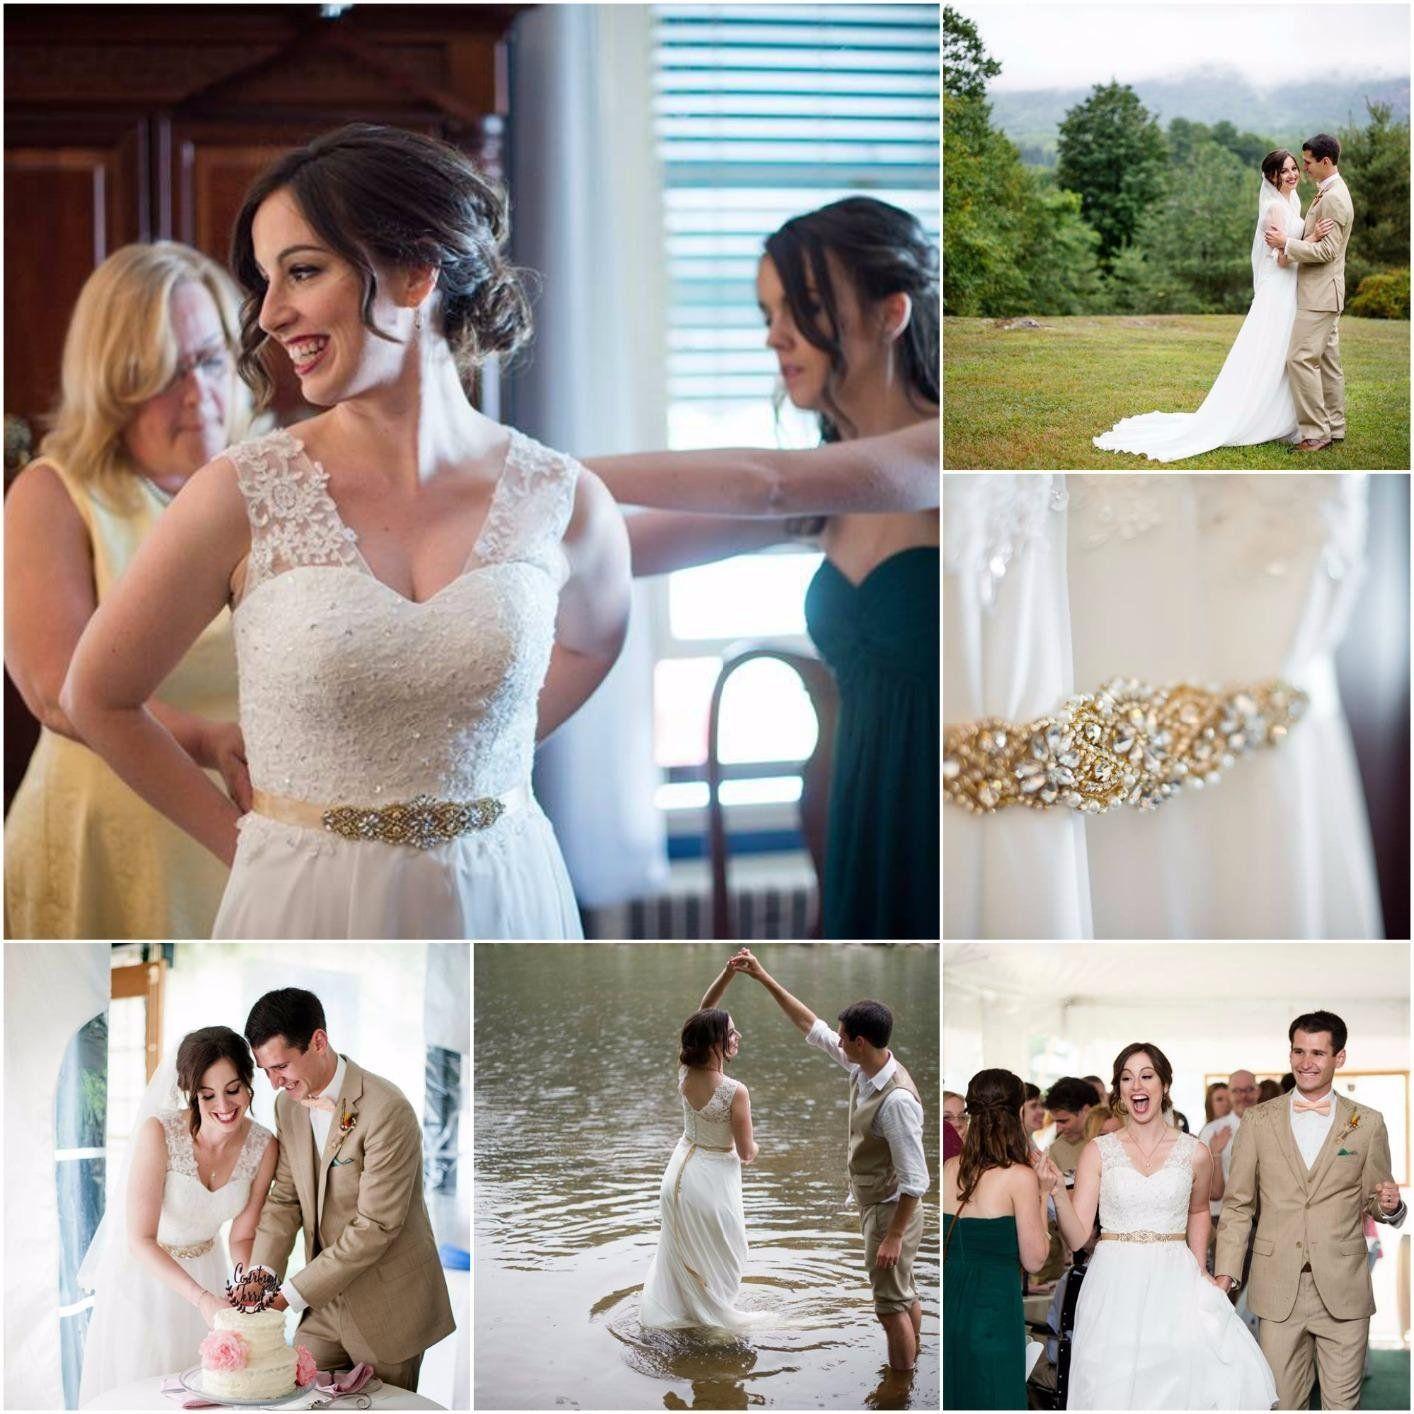 The lightbox wedding dresses  JAEDEN Wedding Dresses Bridal Gowns Beach Wedding Dress Lace Bridal